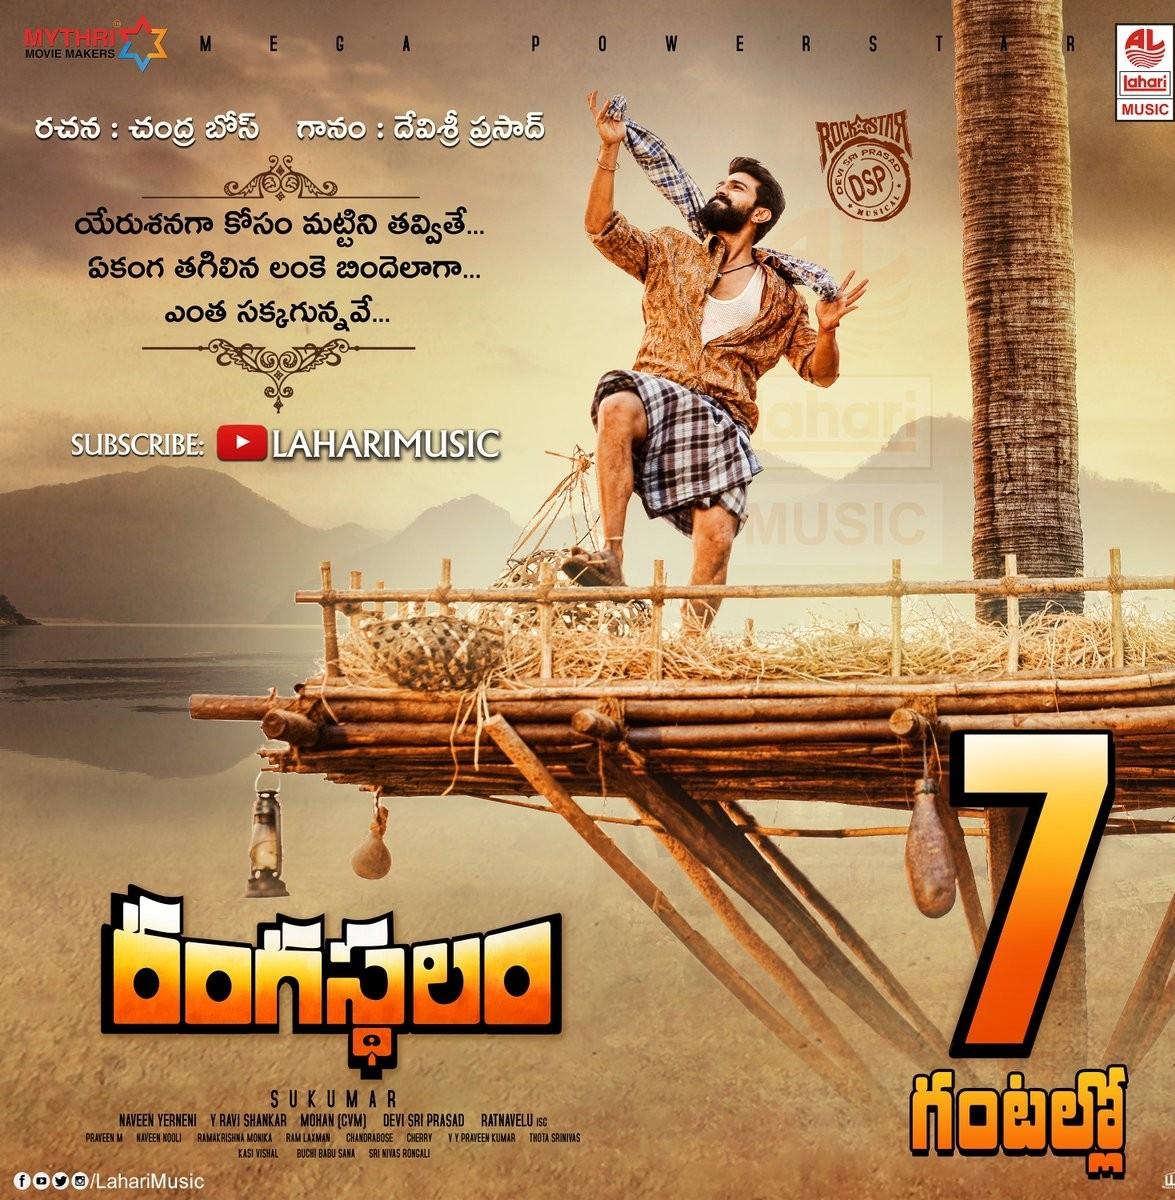 rangasthalam movie online